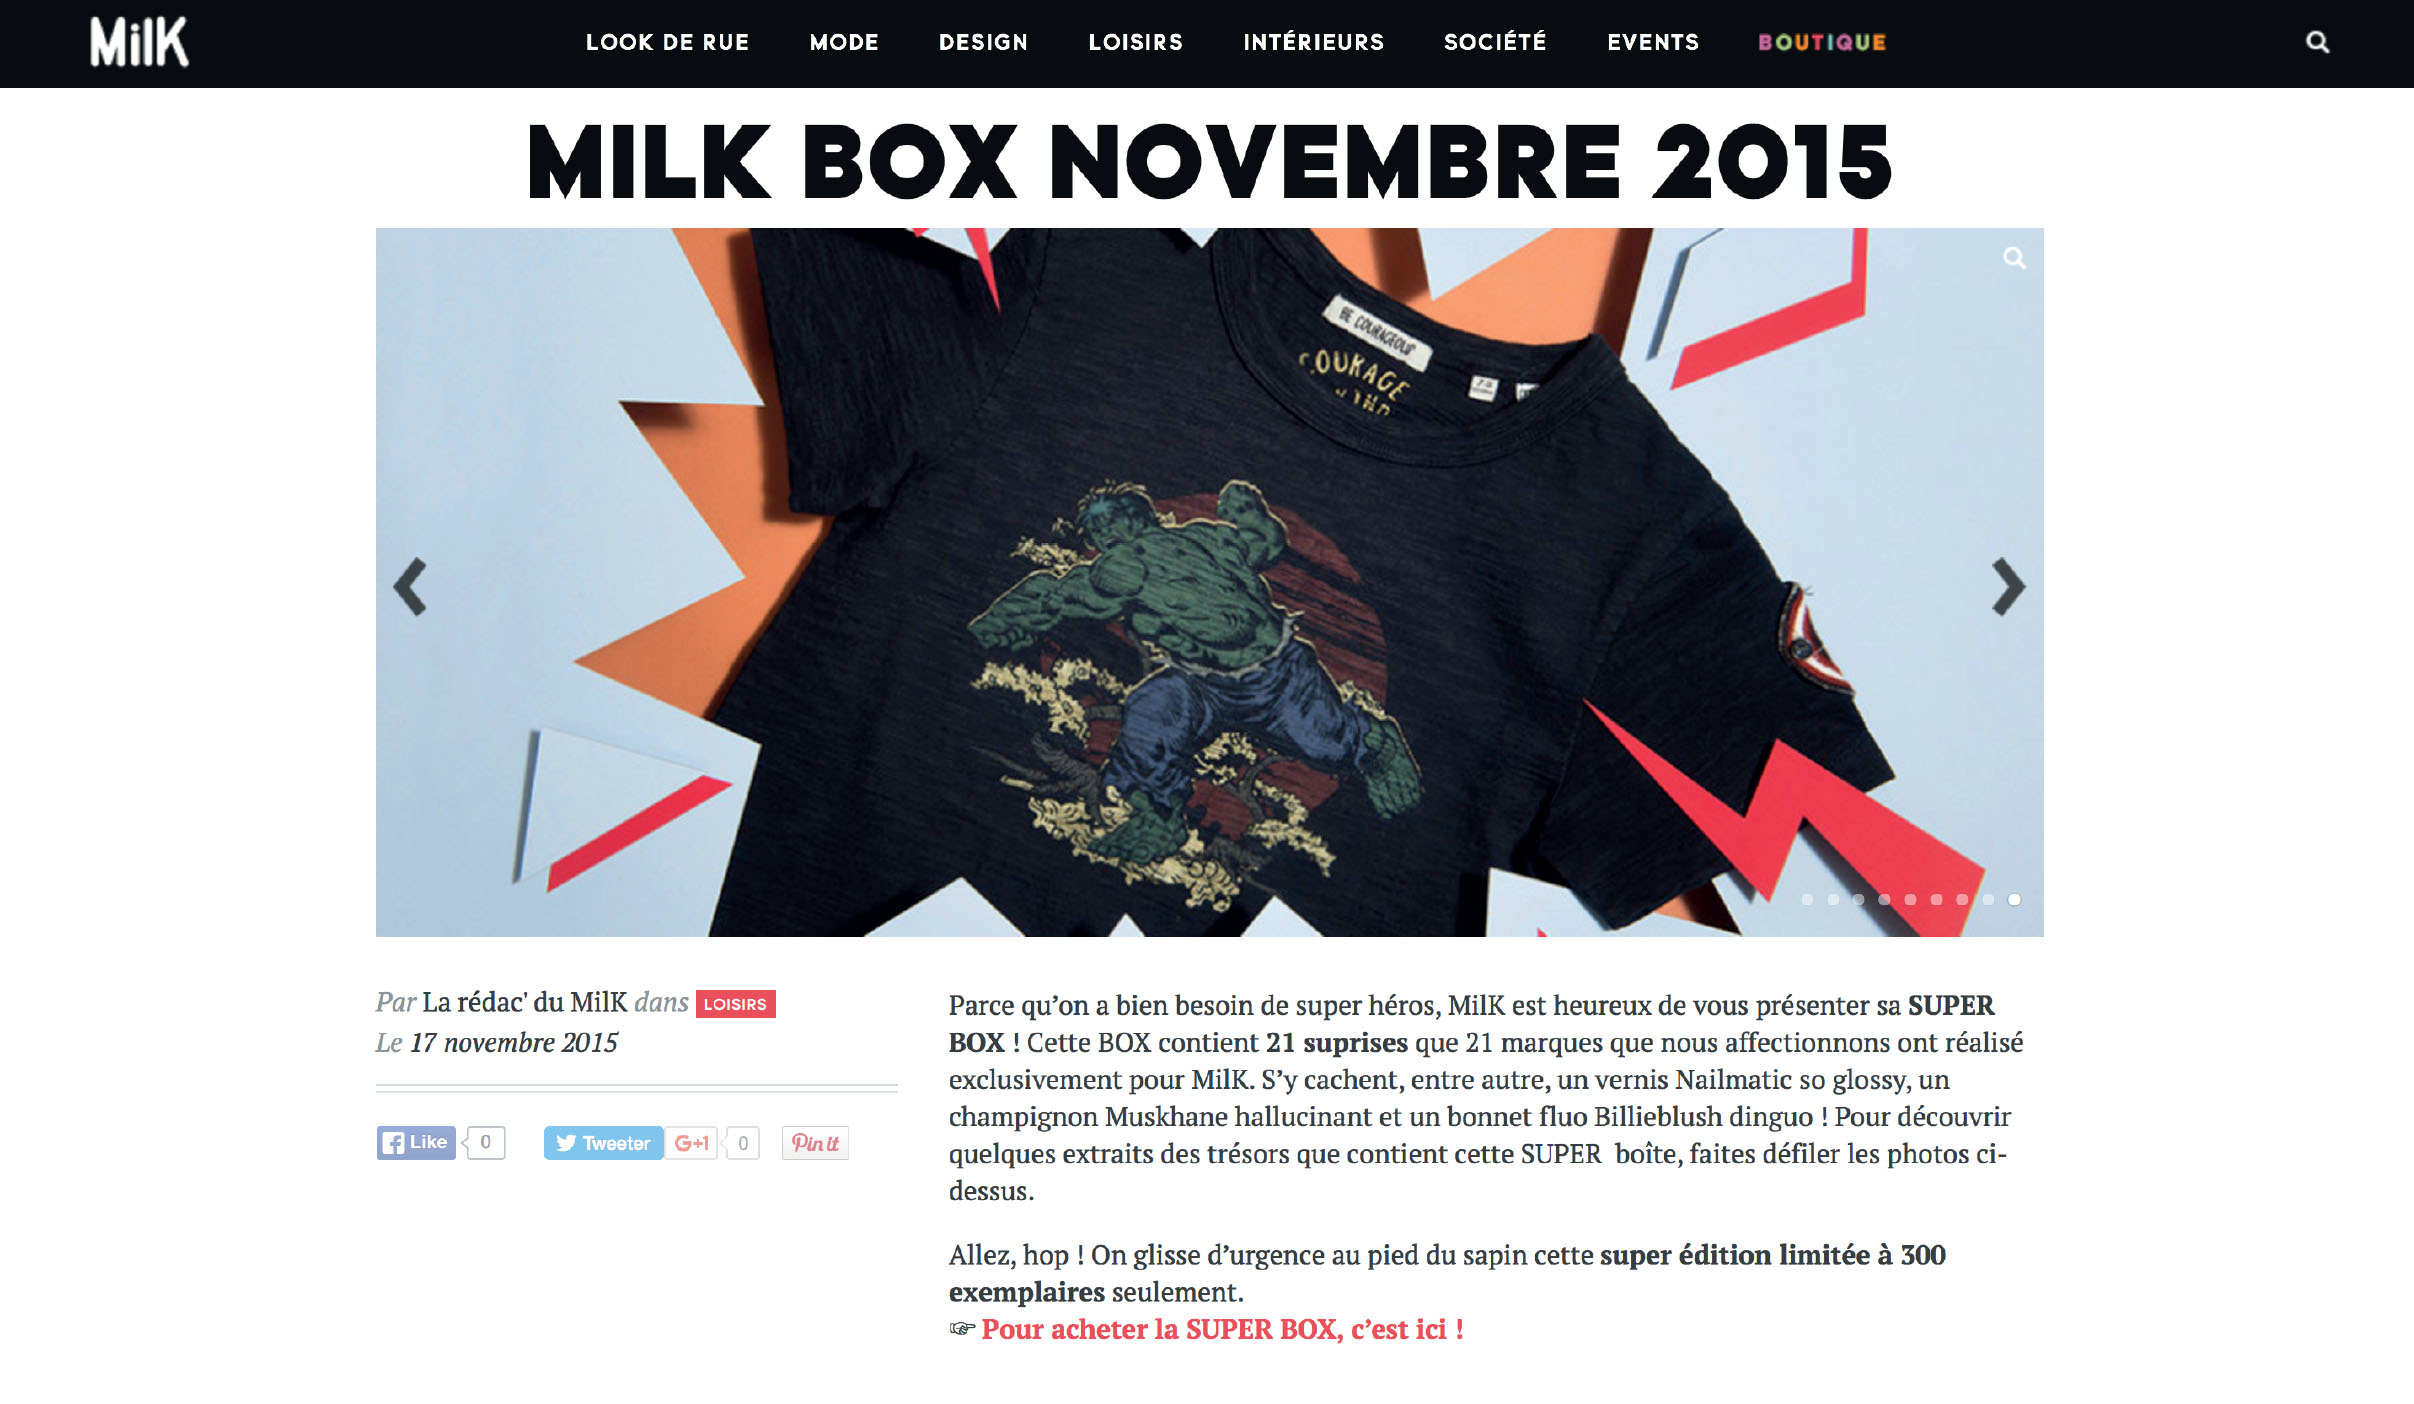 MILK MAGAZINE - MILK BOX Product 2015